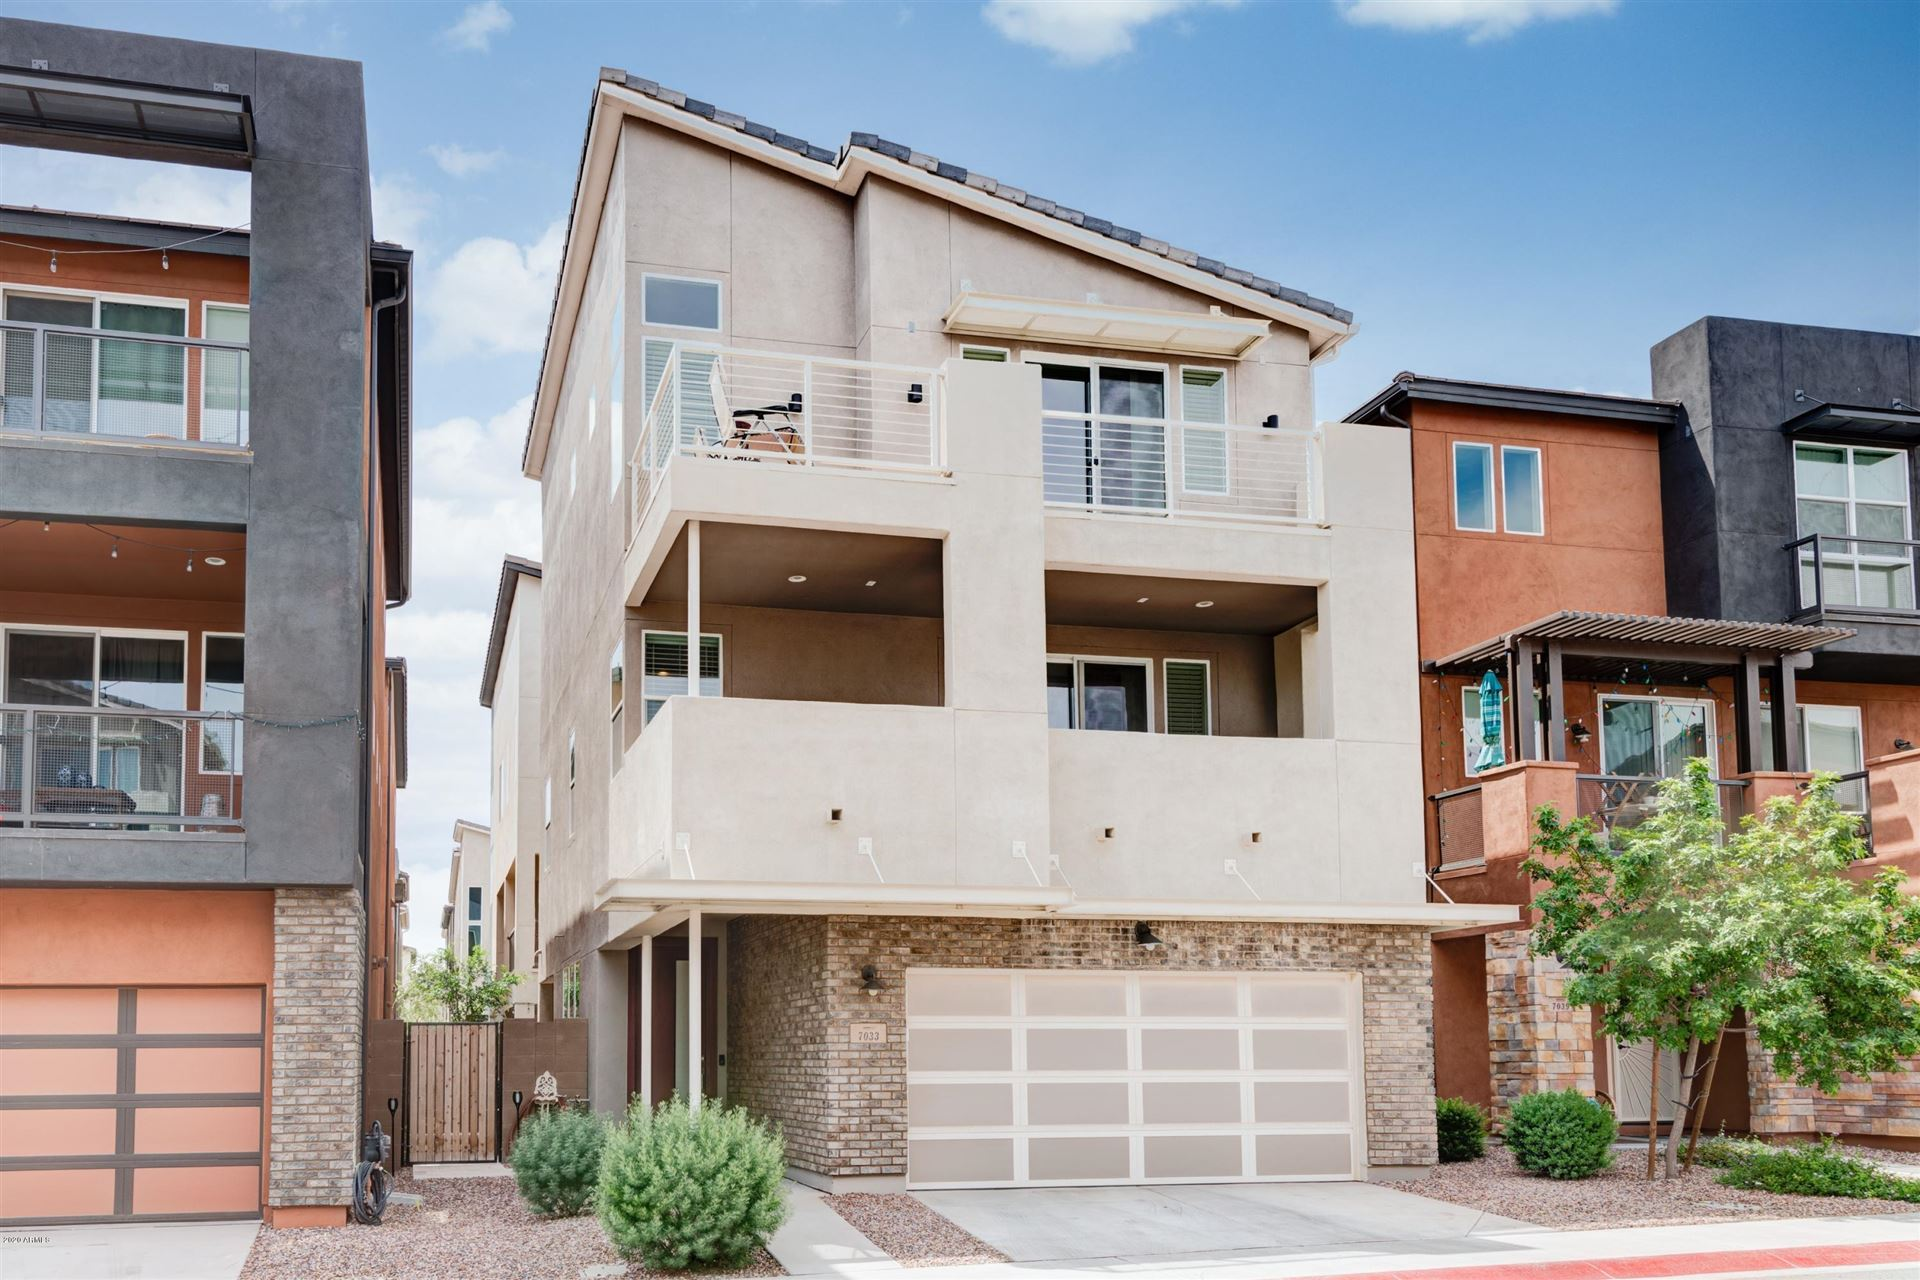 7033 W CORONA Drive, Chandler, AZ 85226 - MLS#: 6072306